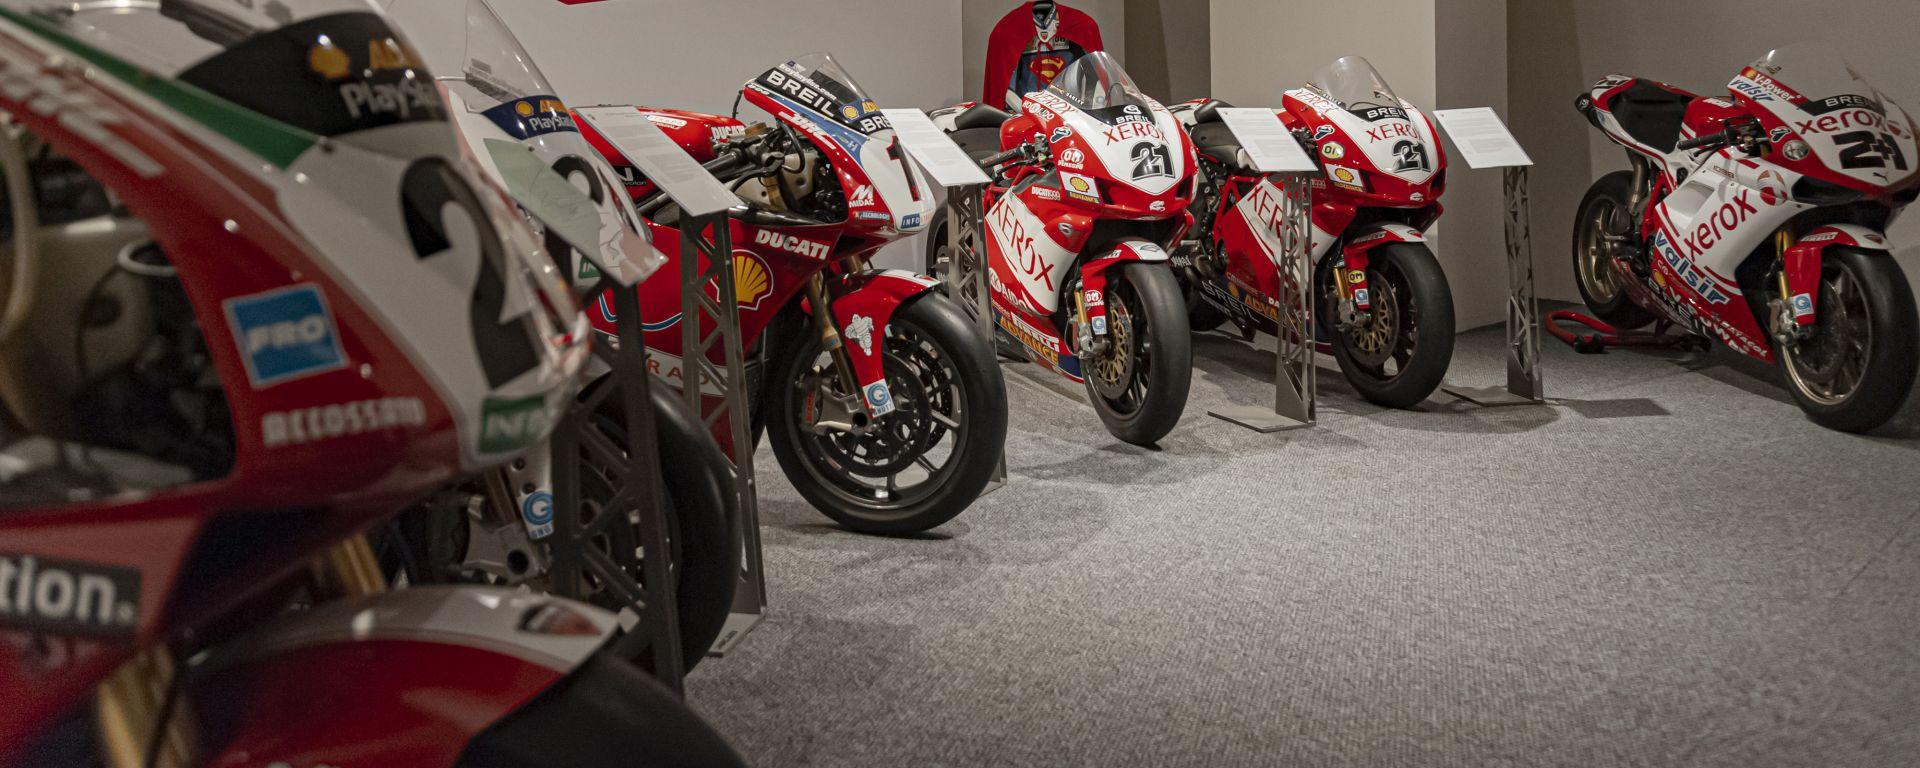 Troy Story: al Museo Ducati la mostra temporanea dedicata a Bayliss